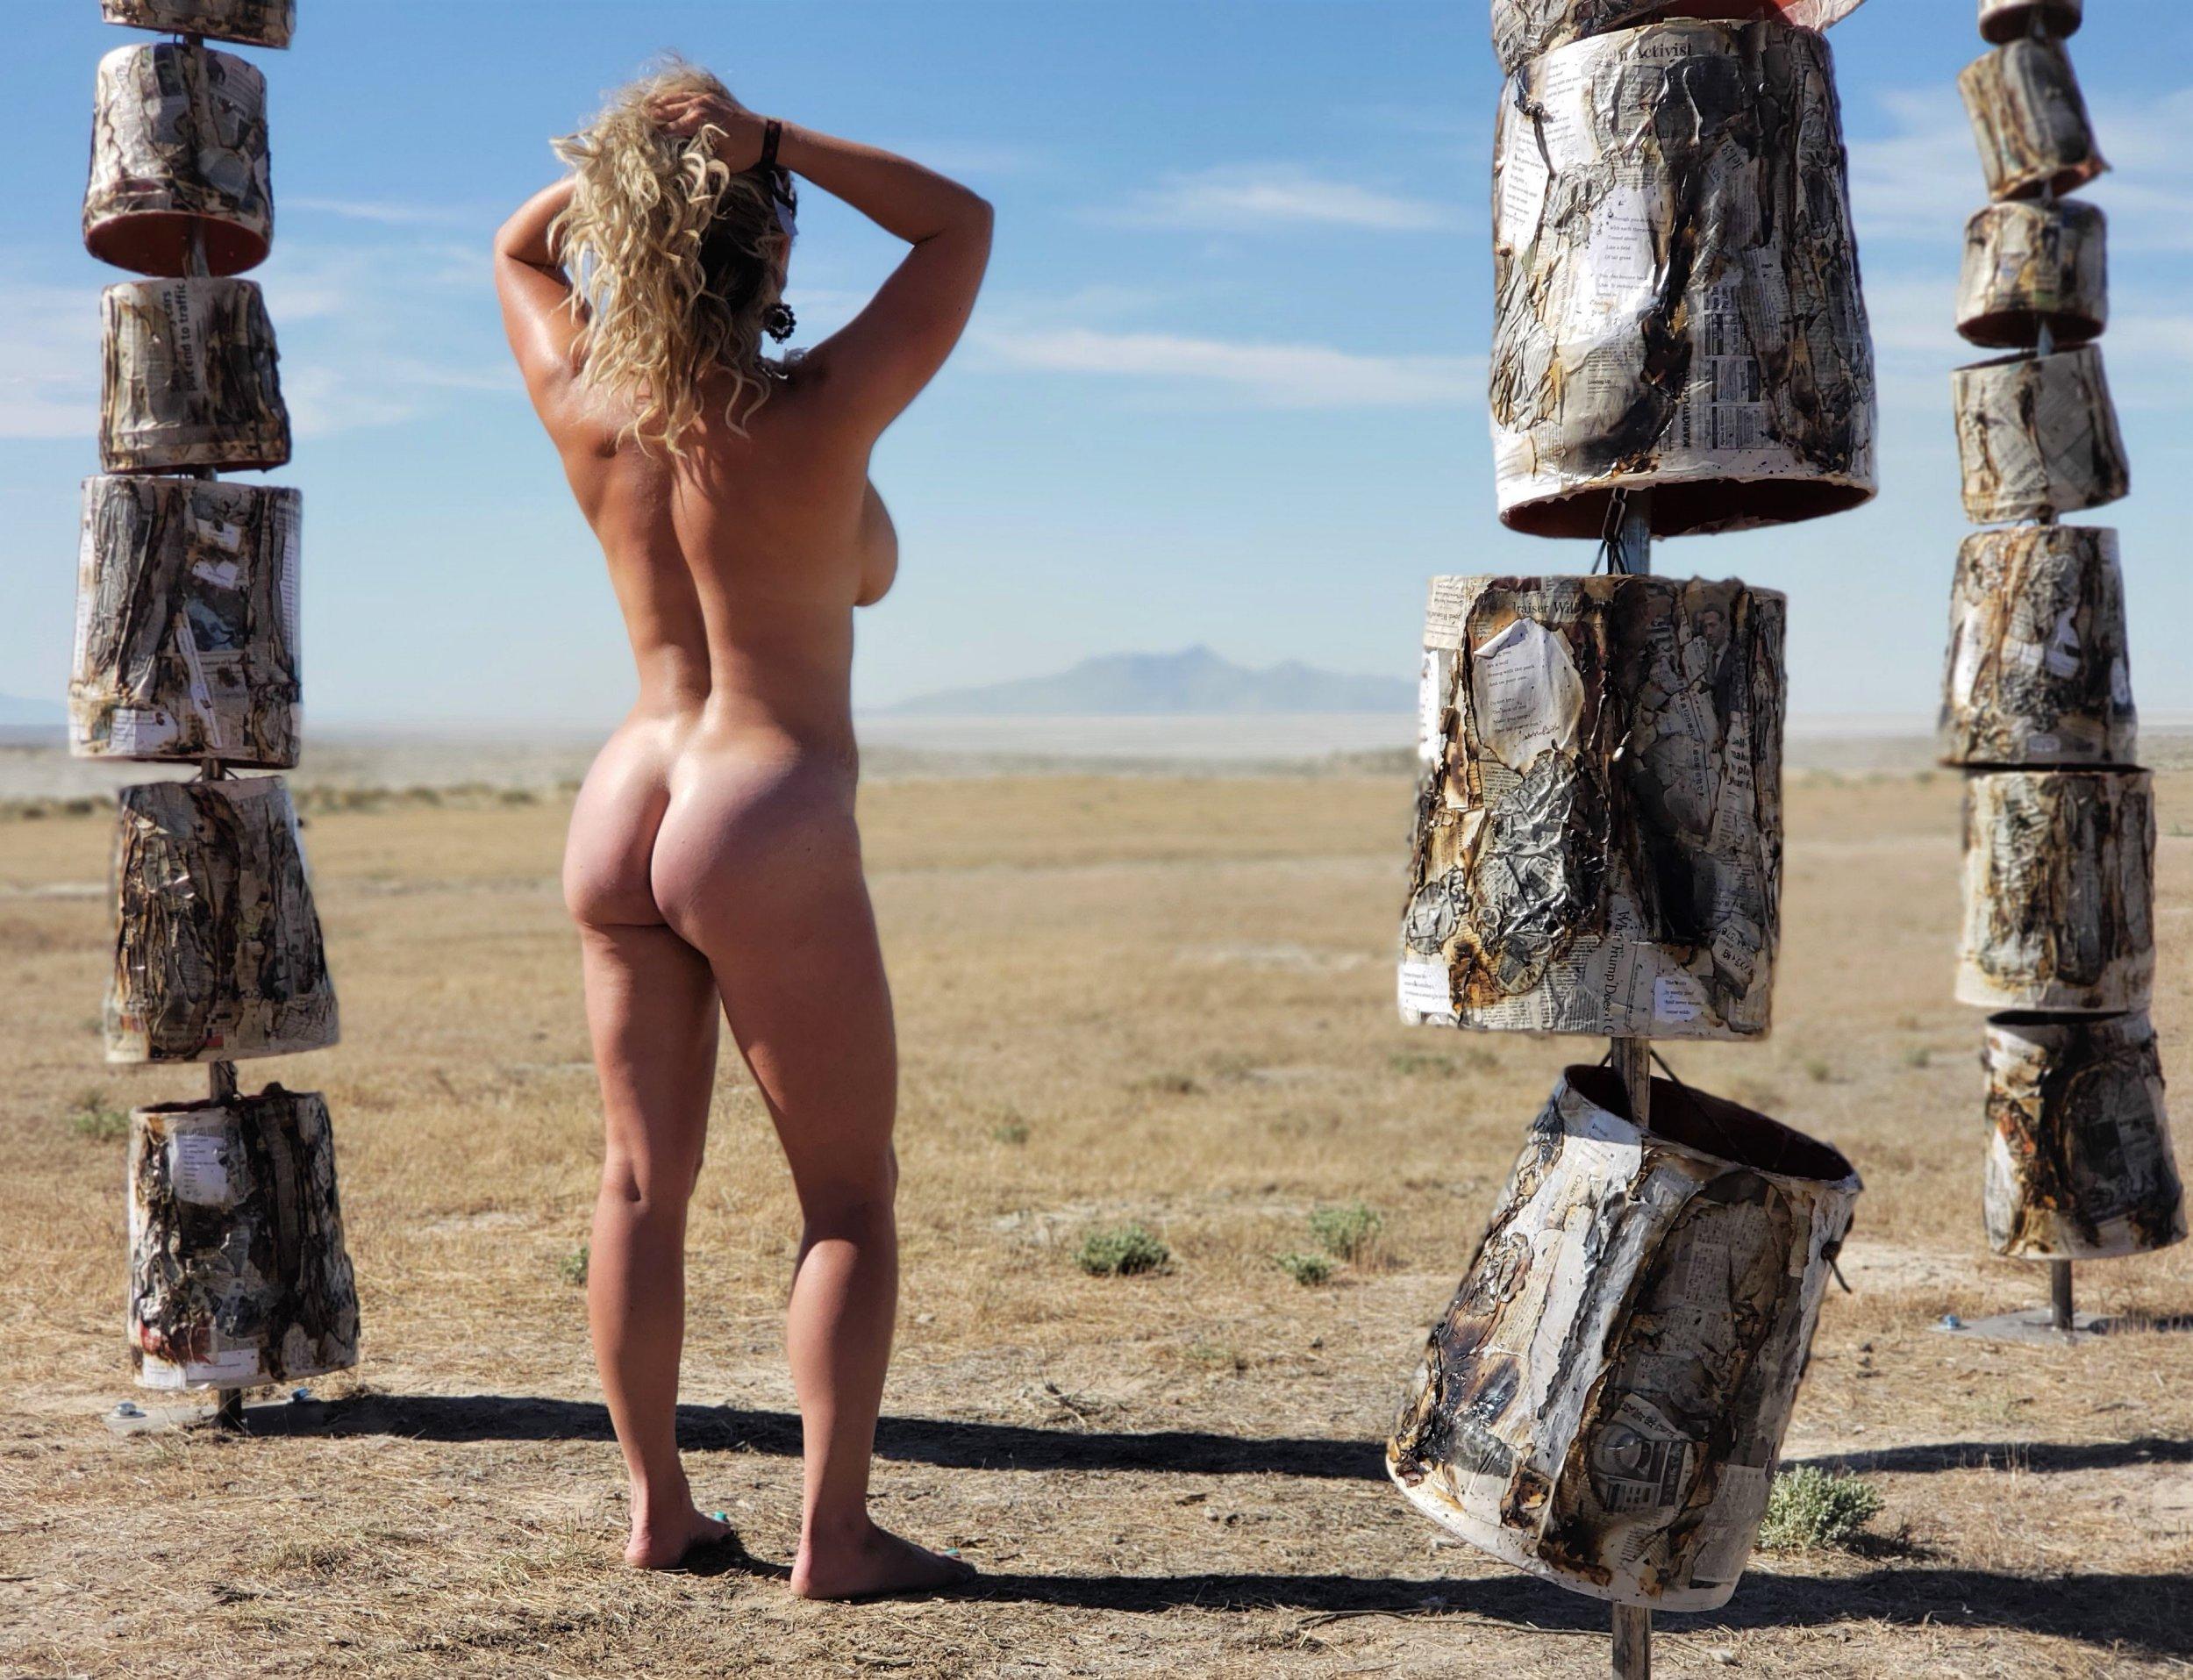 Porn pics of luciana paluzzi page